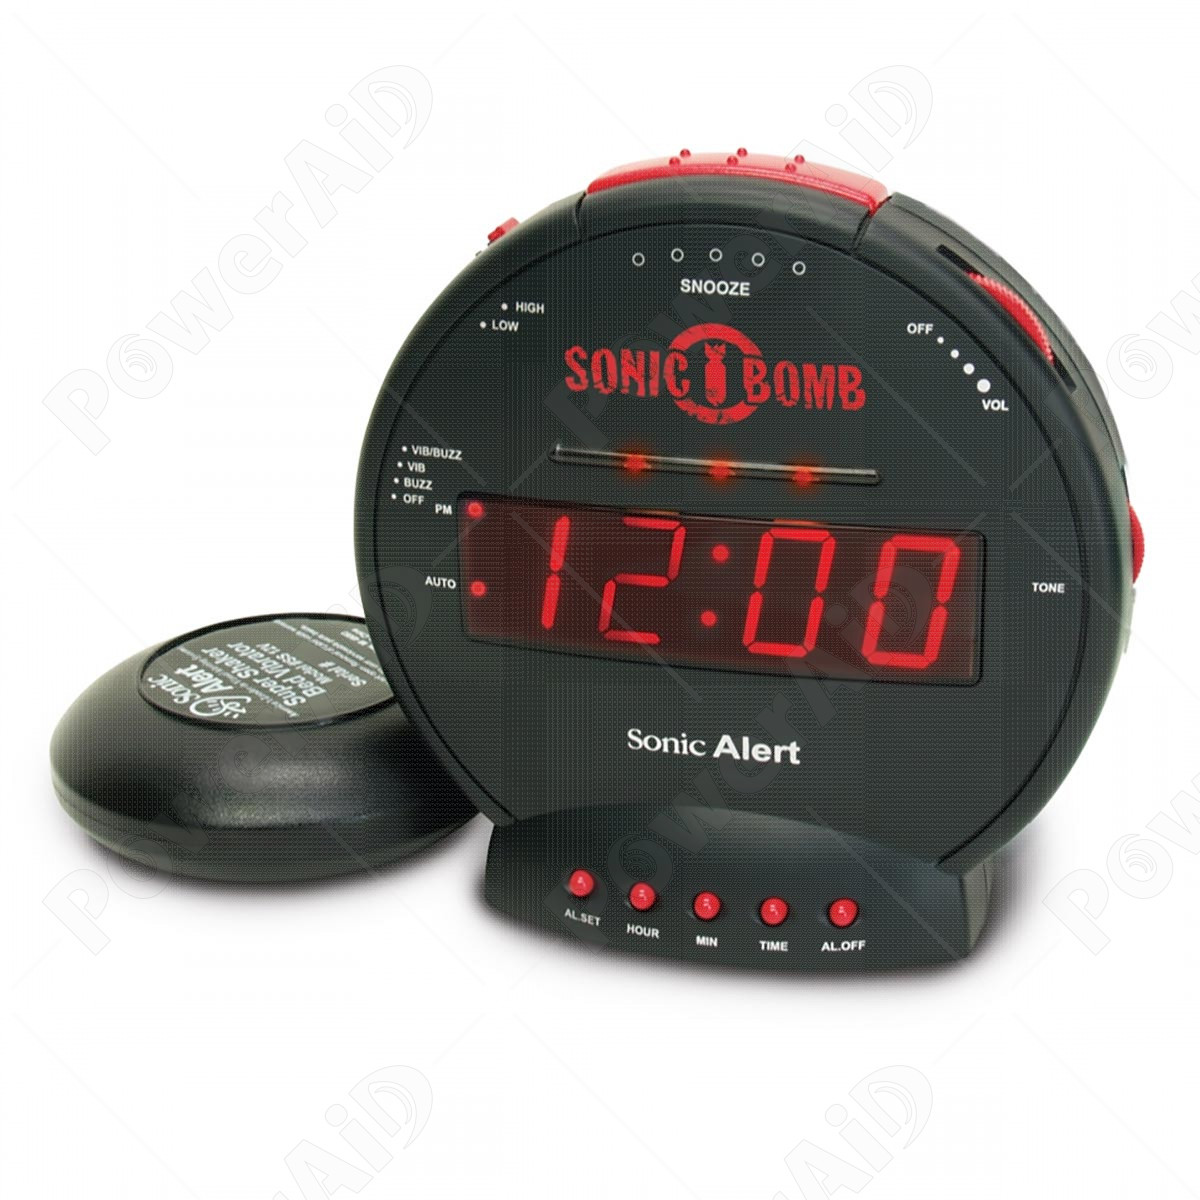 Sonic Alert - Sonic Bomb Sveglia digitale